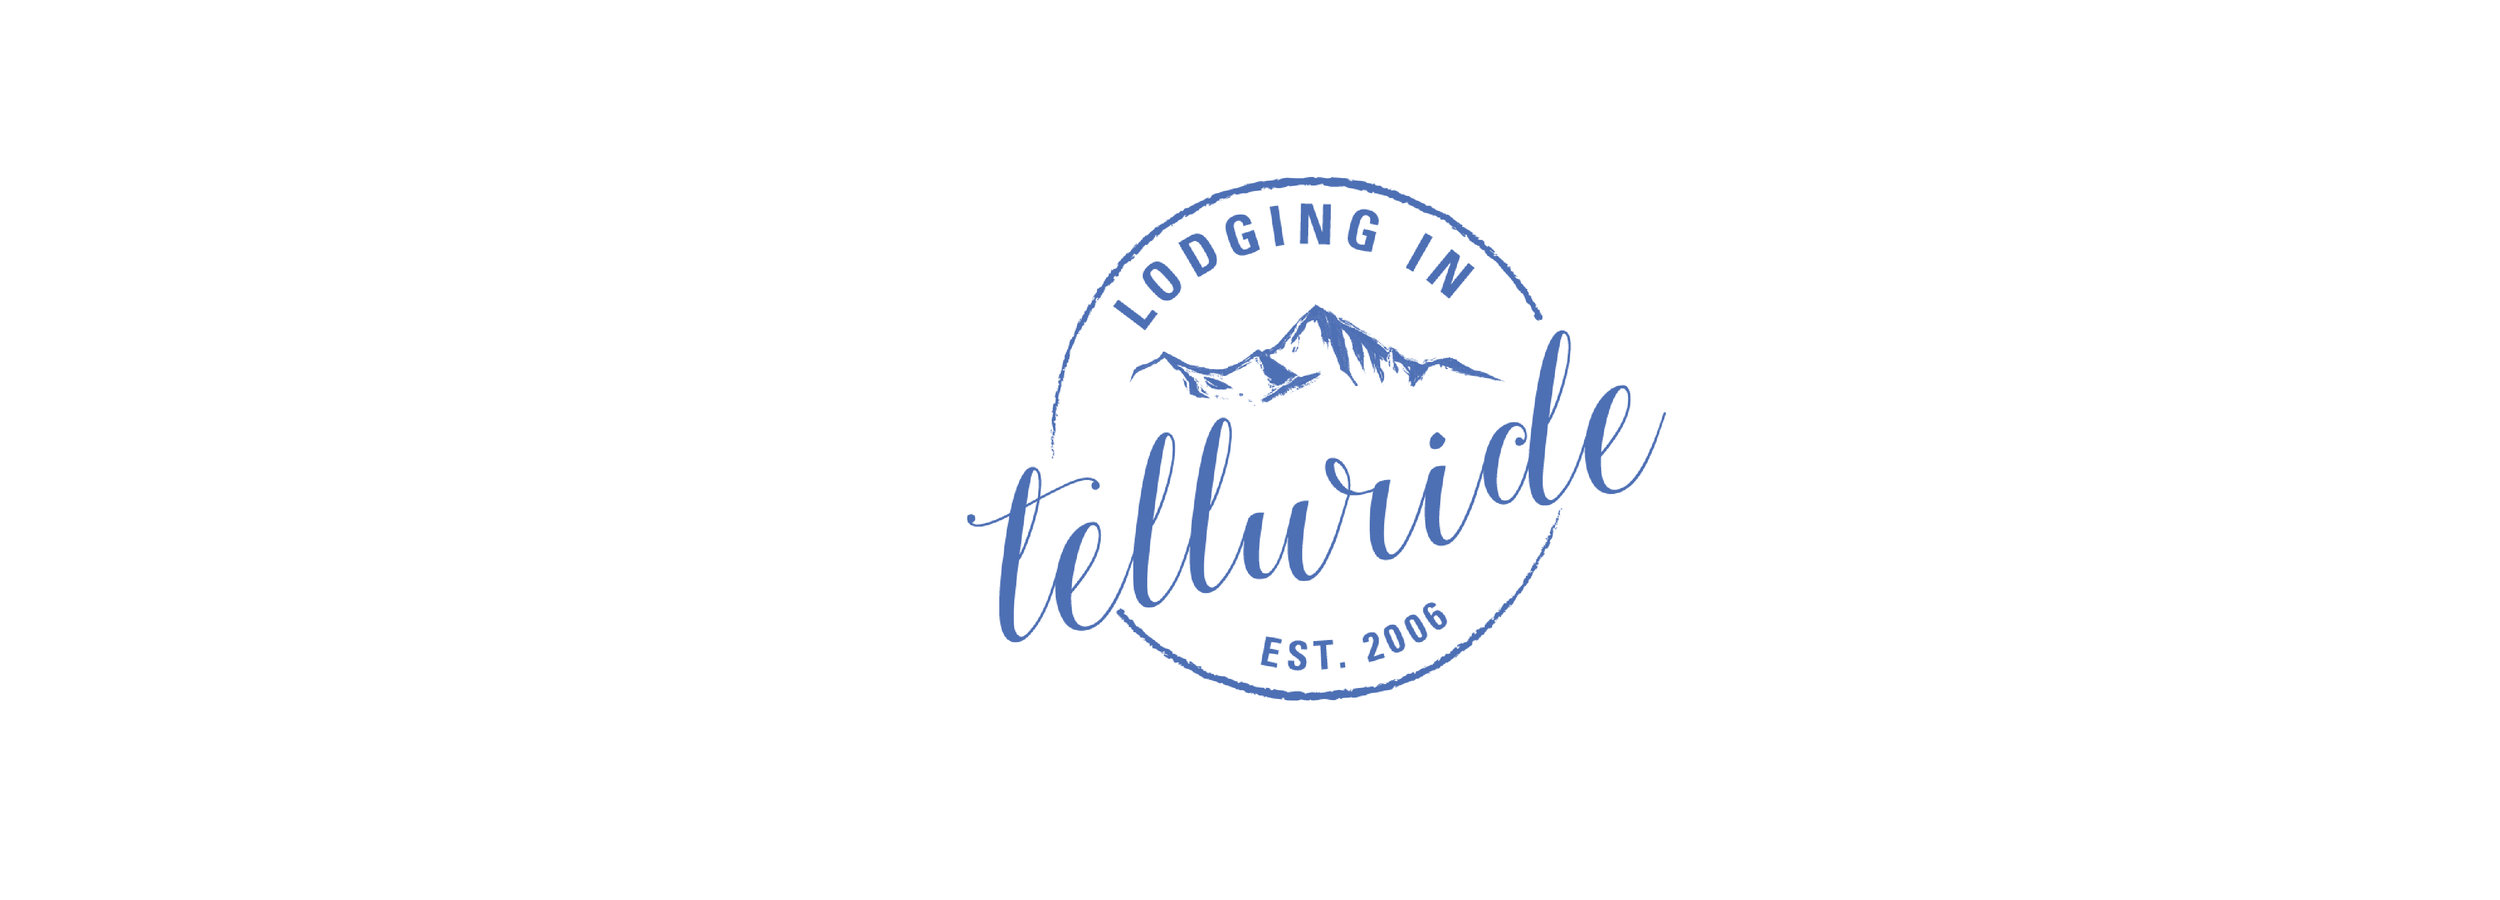 Lodging in Telluride logo-01-01.jpg